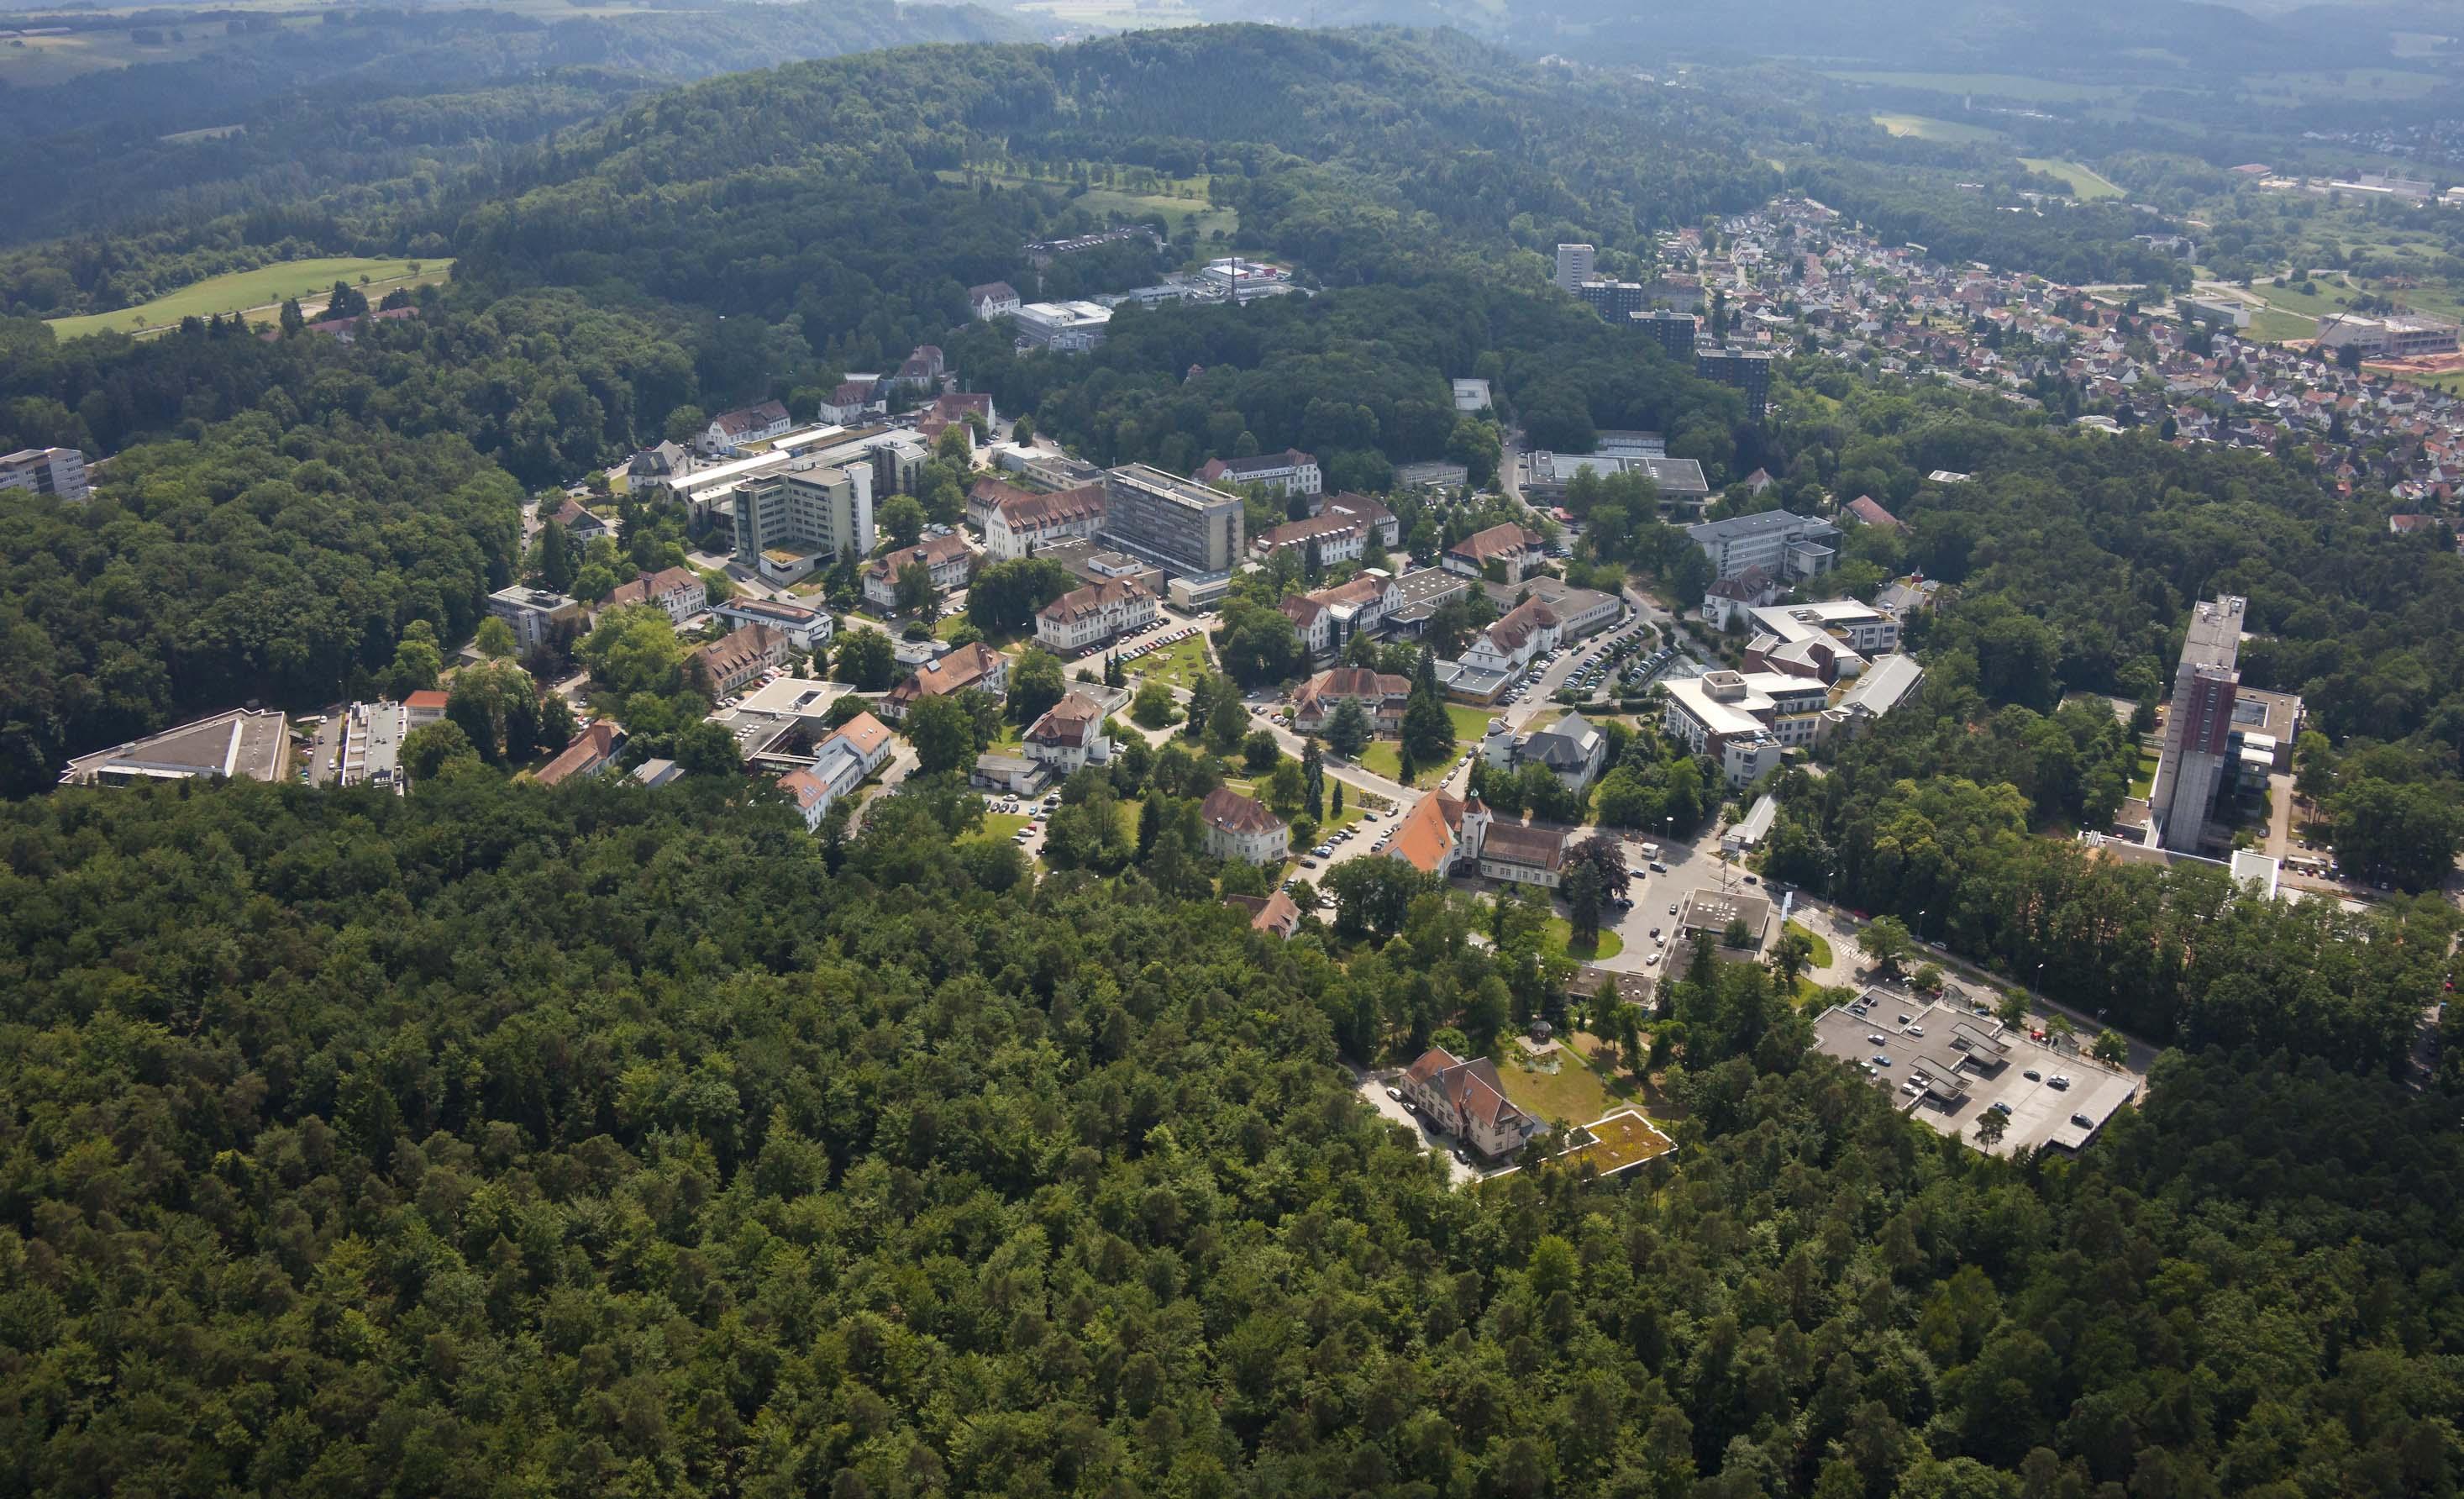 Uniklinikum Saarland Medizin studieren